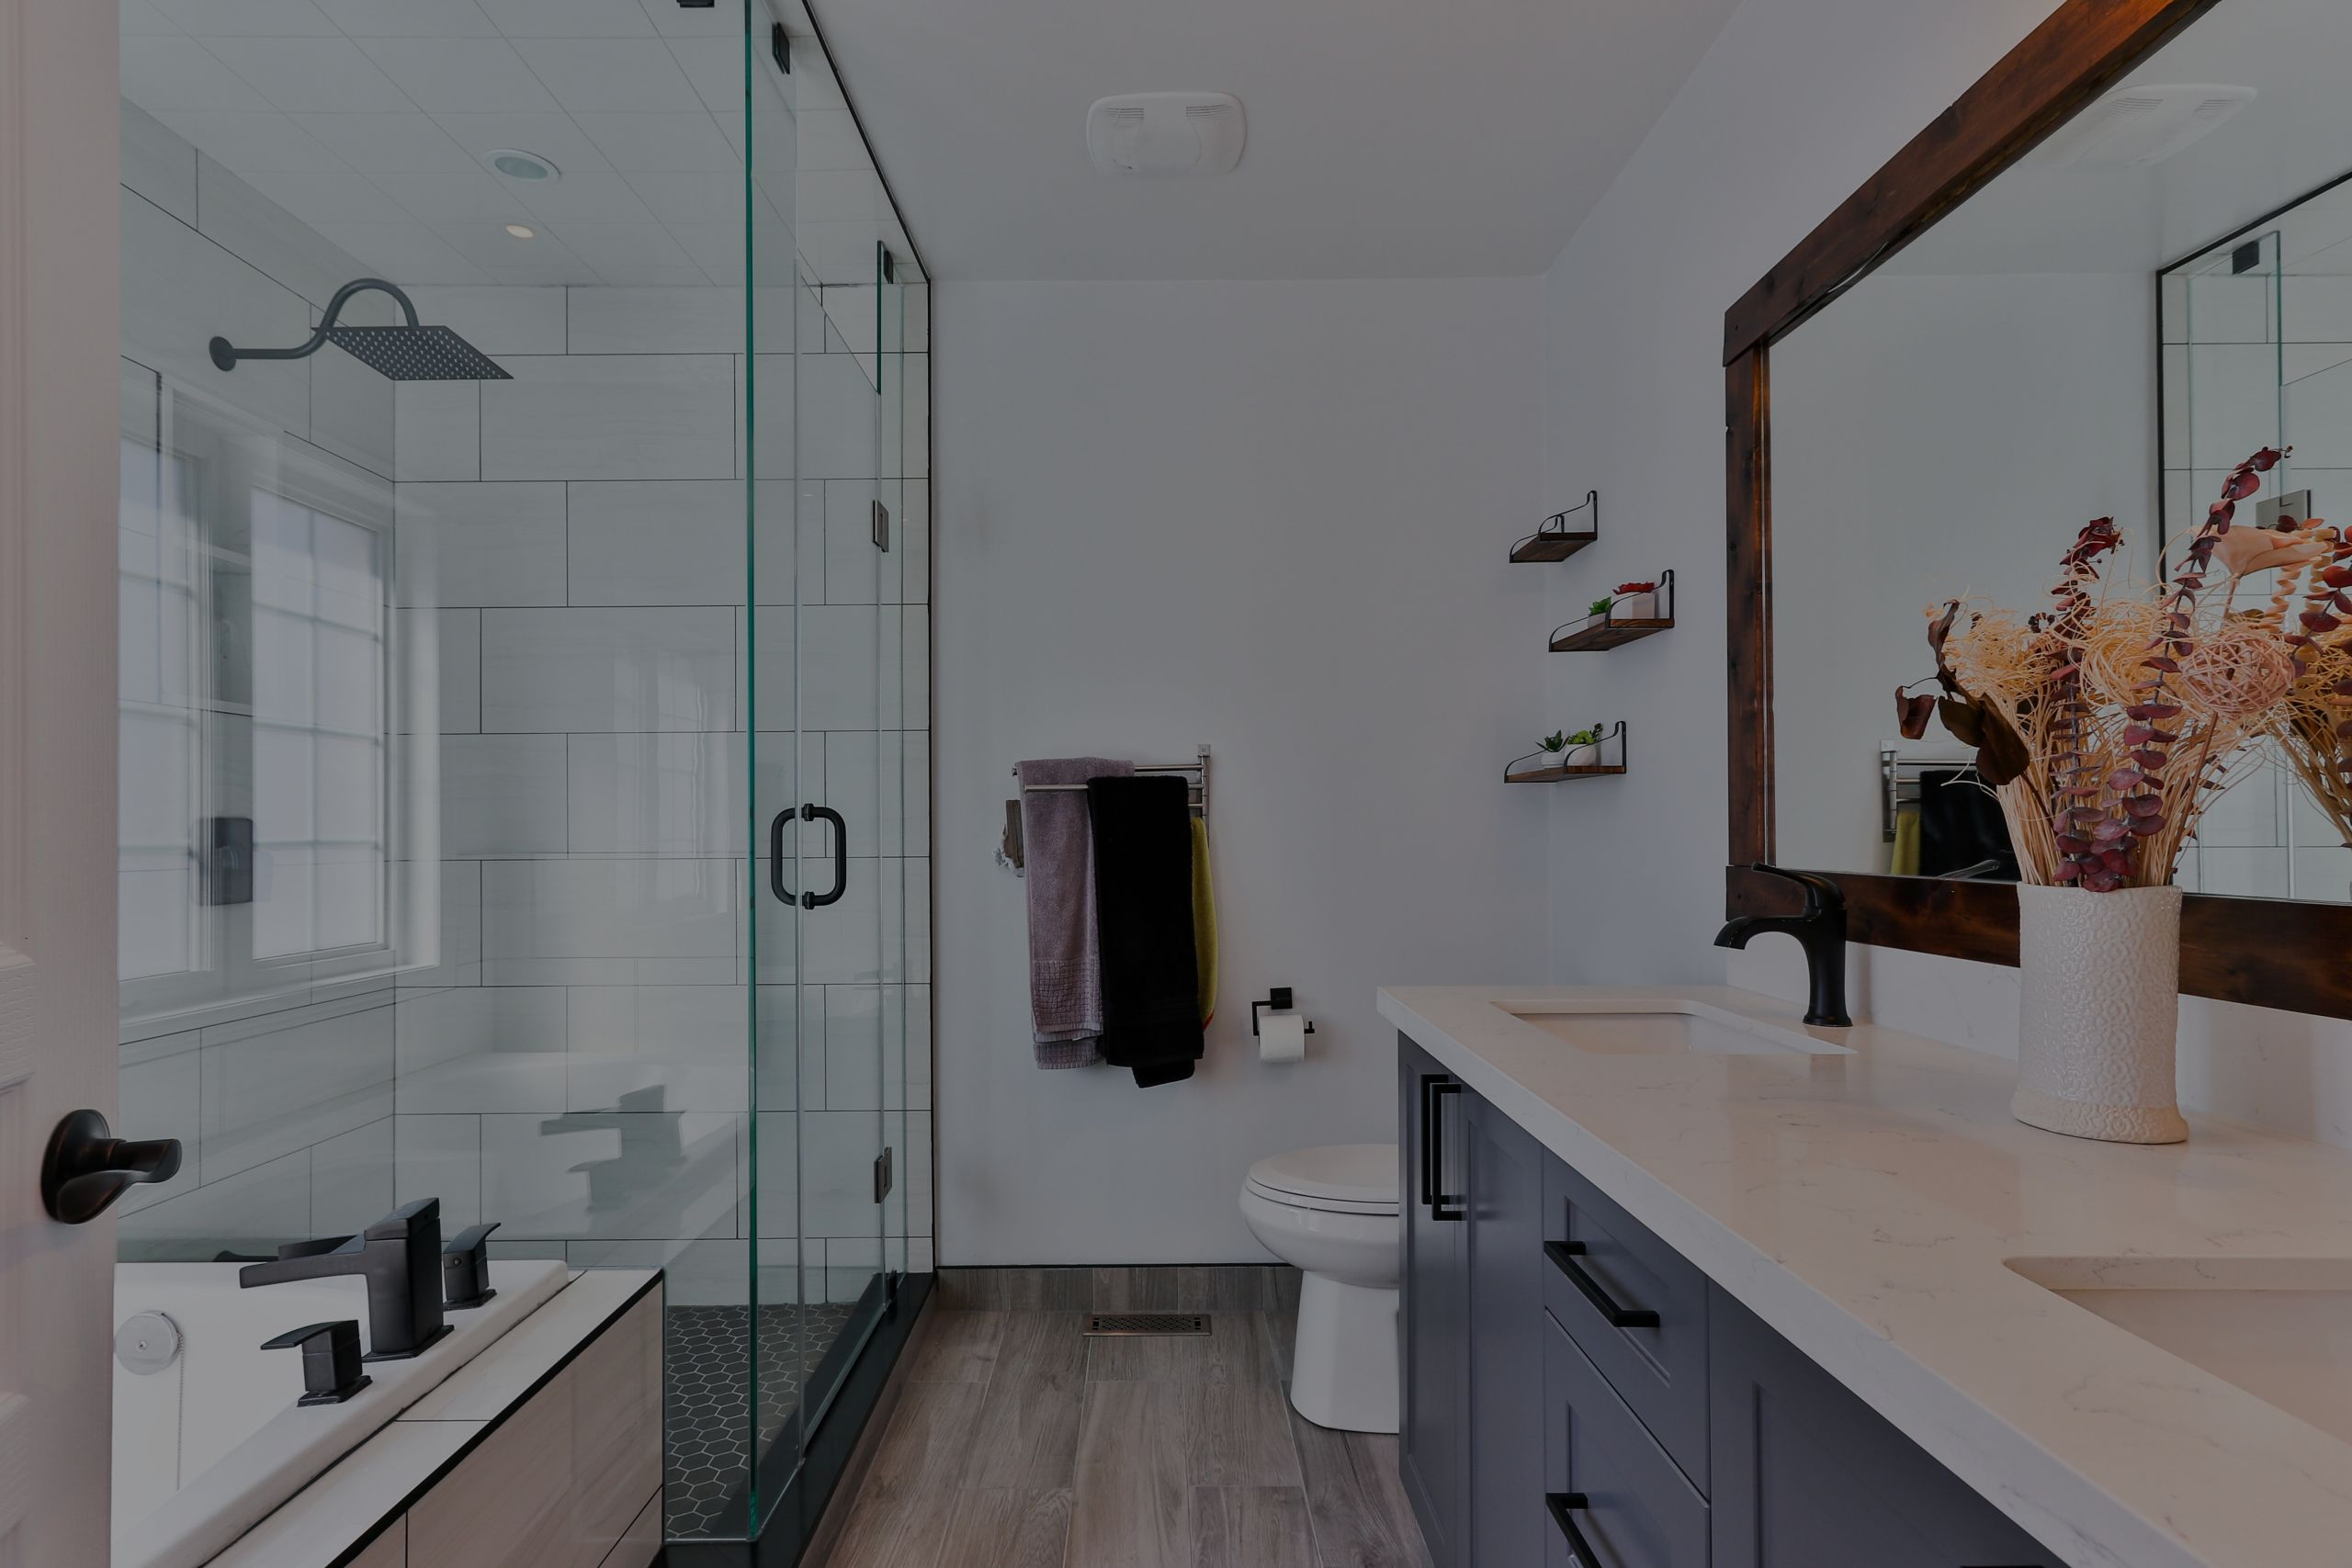 Bathroom Renovation Tips to Increase ROI